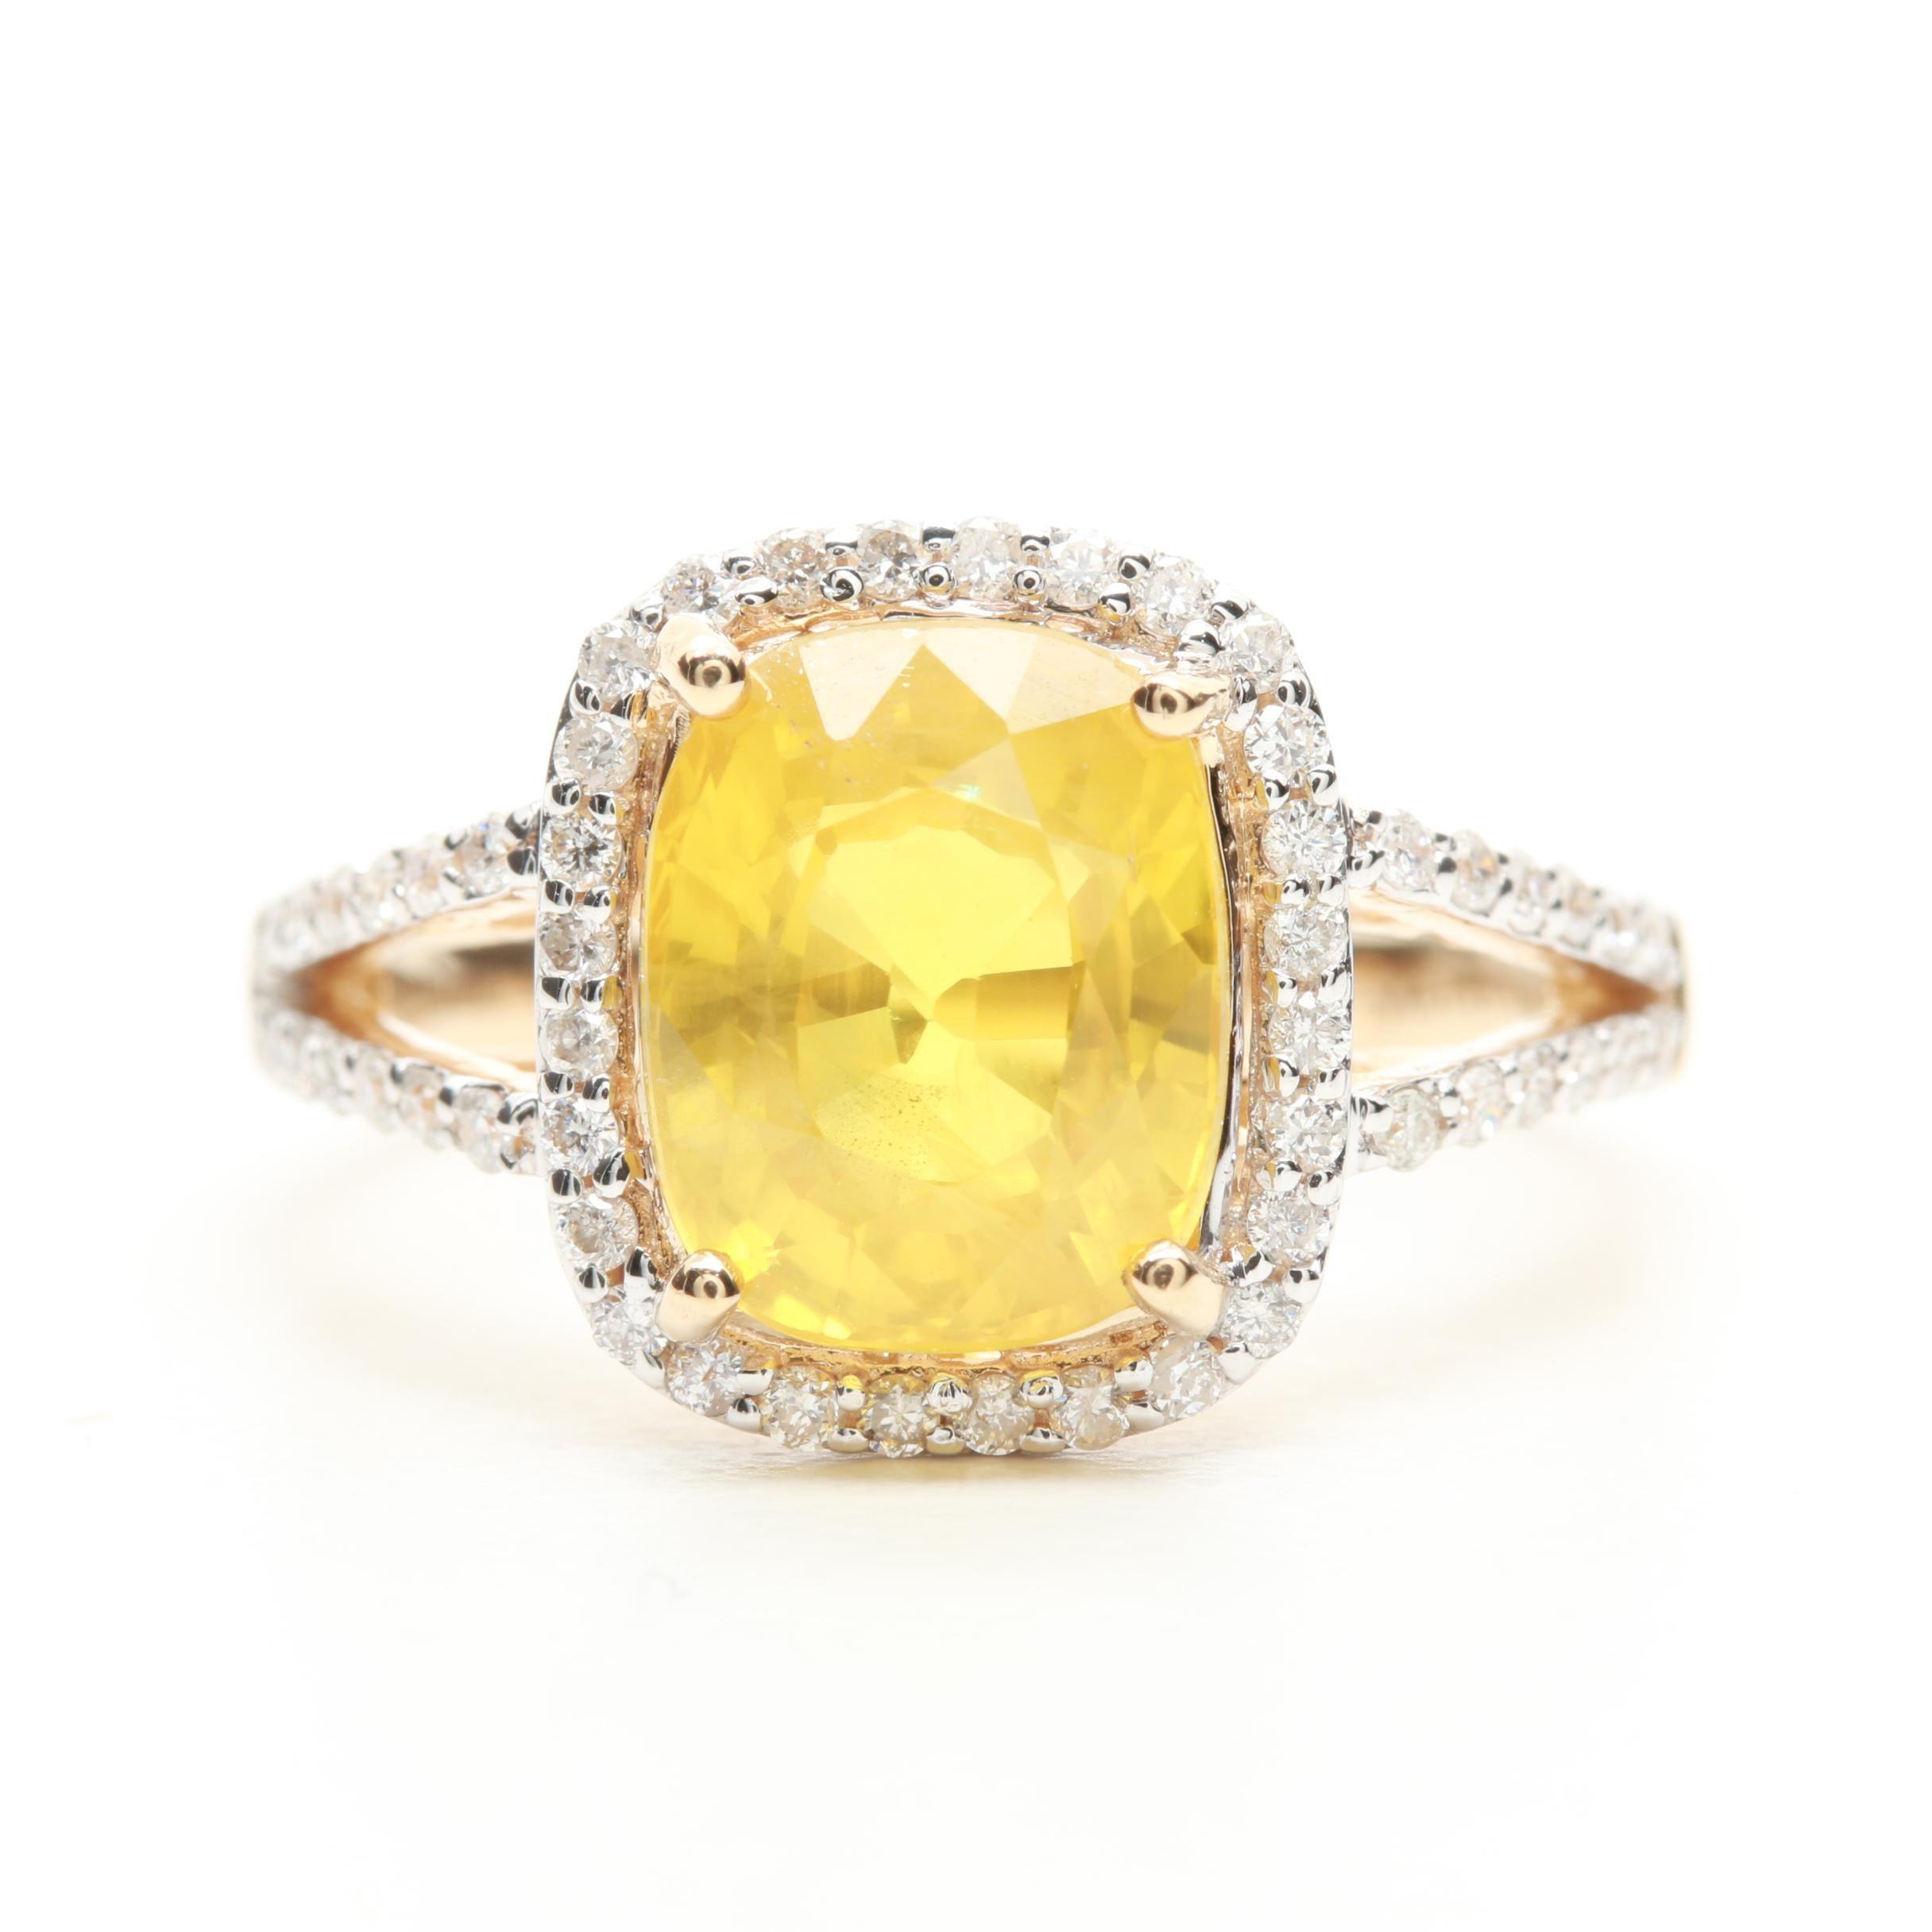 14K Yellow Gold 3.74 CT Yellow Sapphire and Diamond Ring